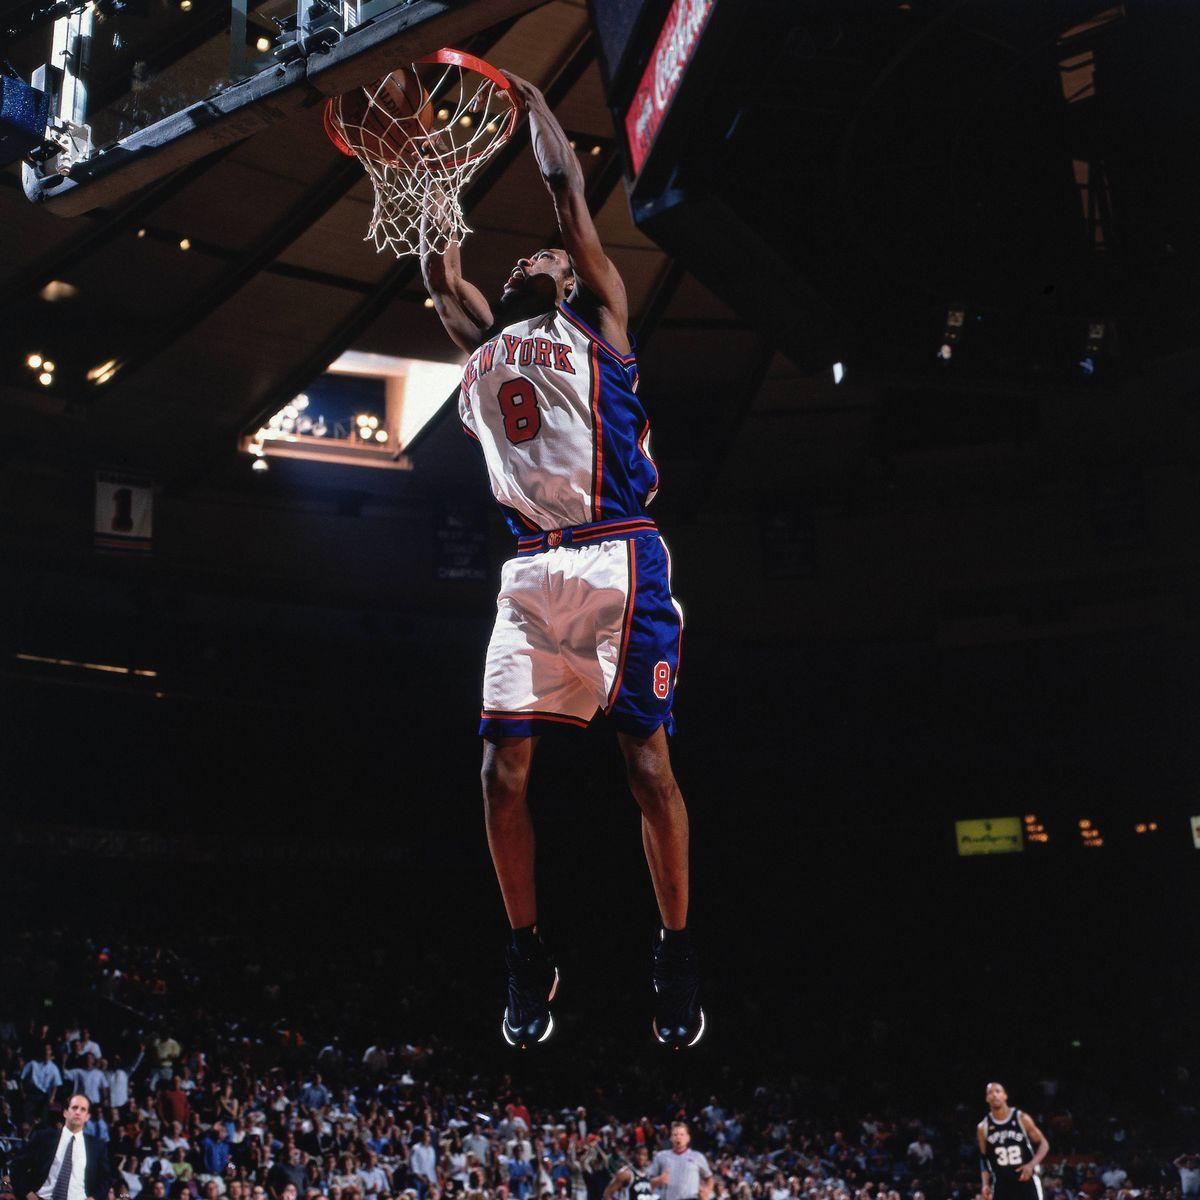 1999 NBA Finals Game 5: San Antonio Spurs vs. New York Knicks